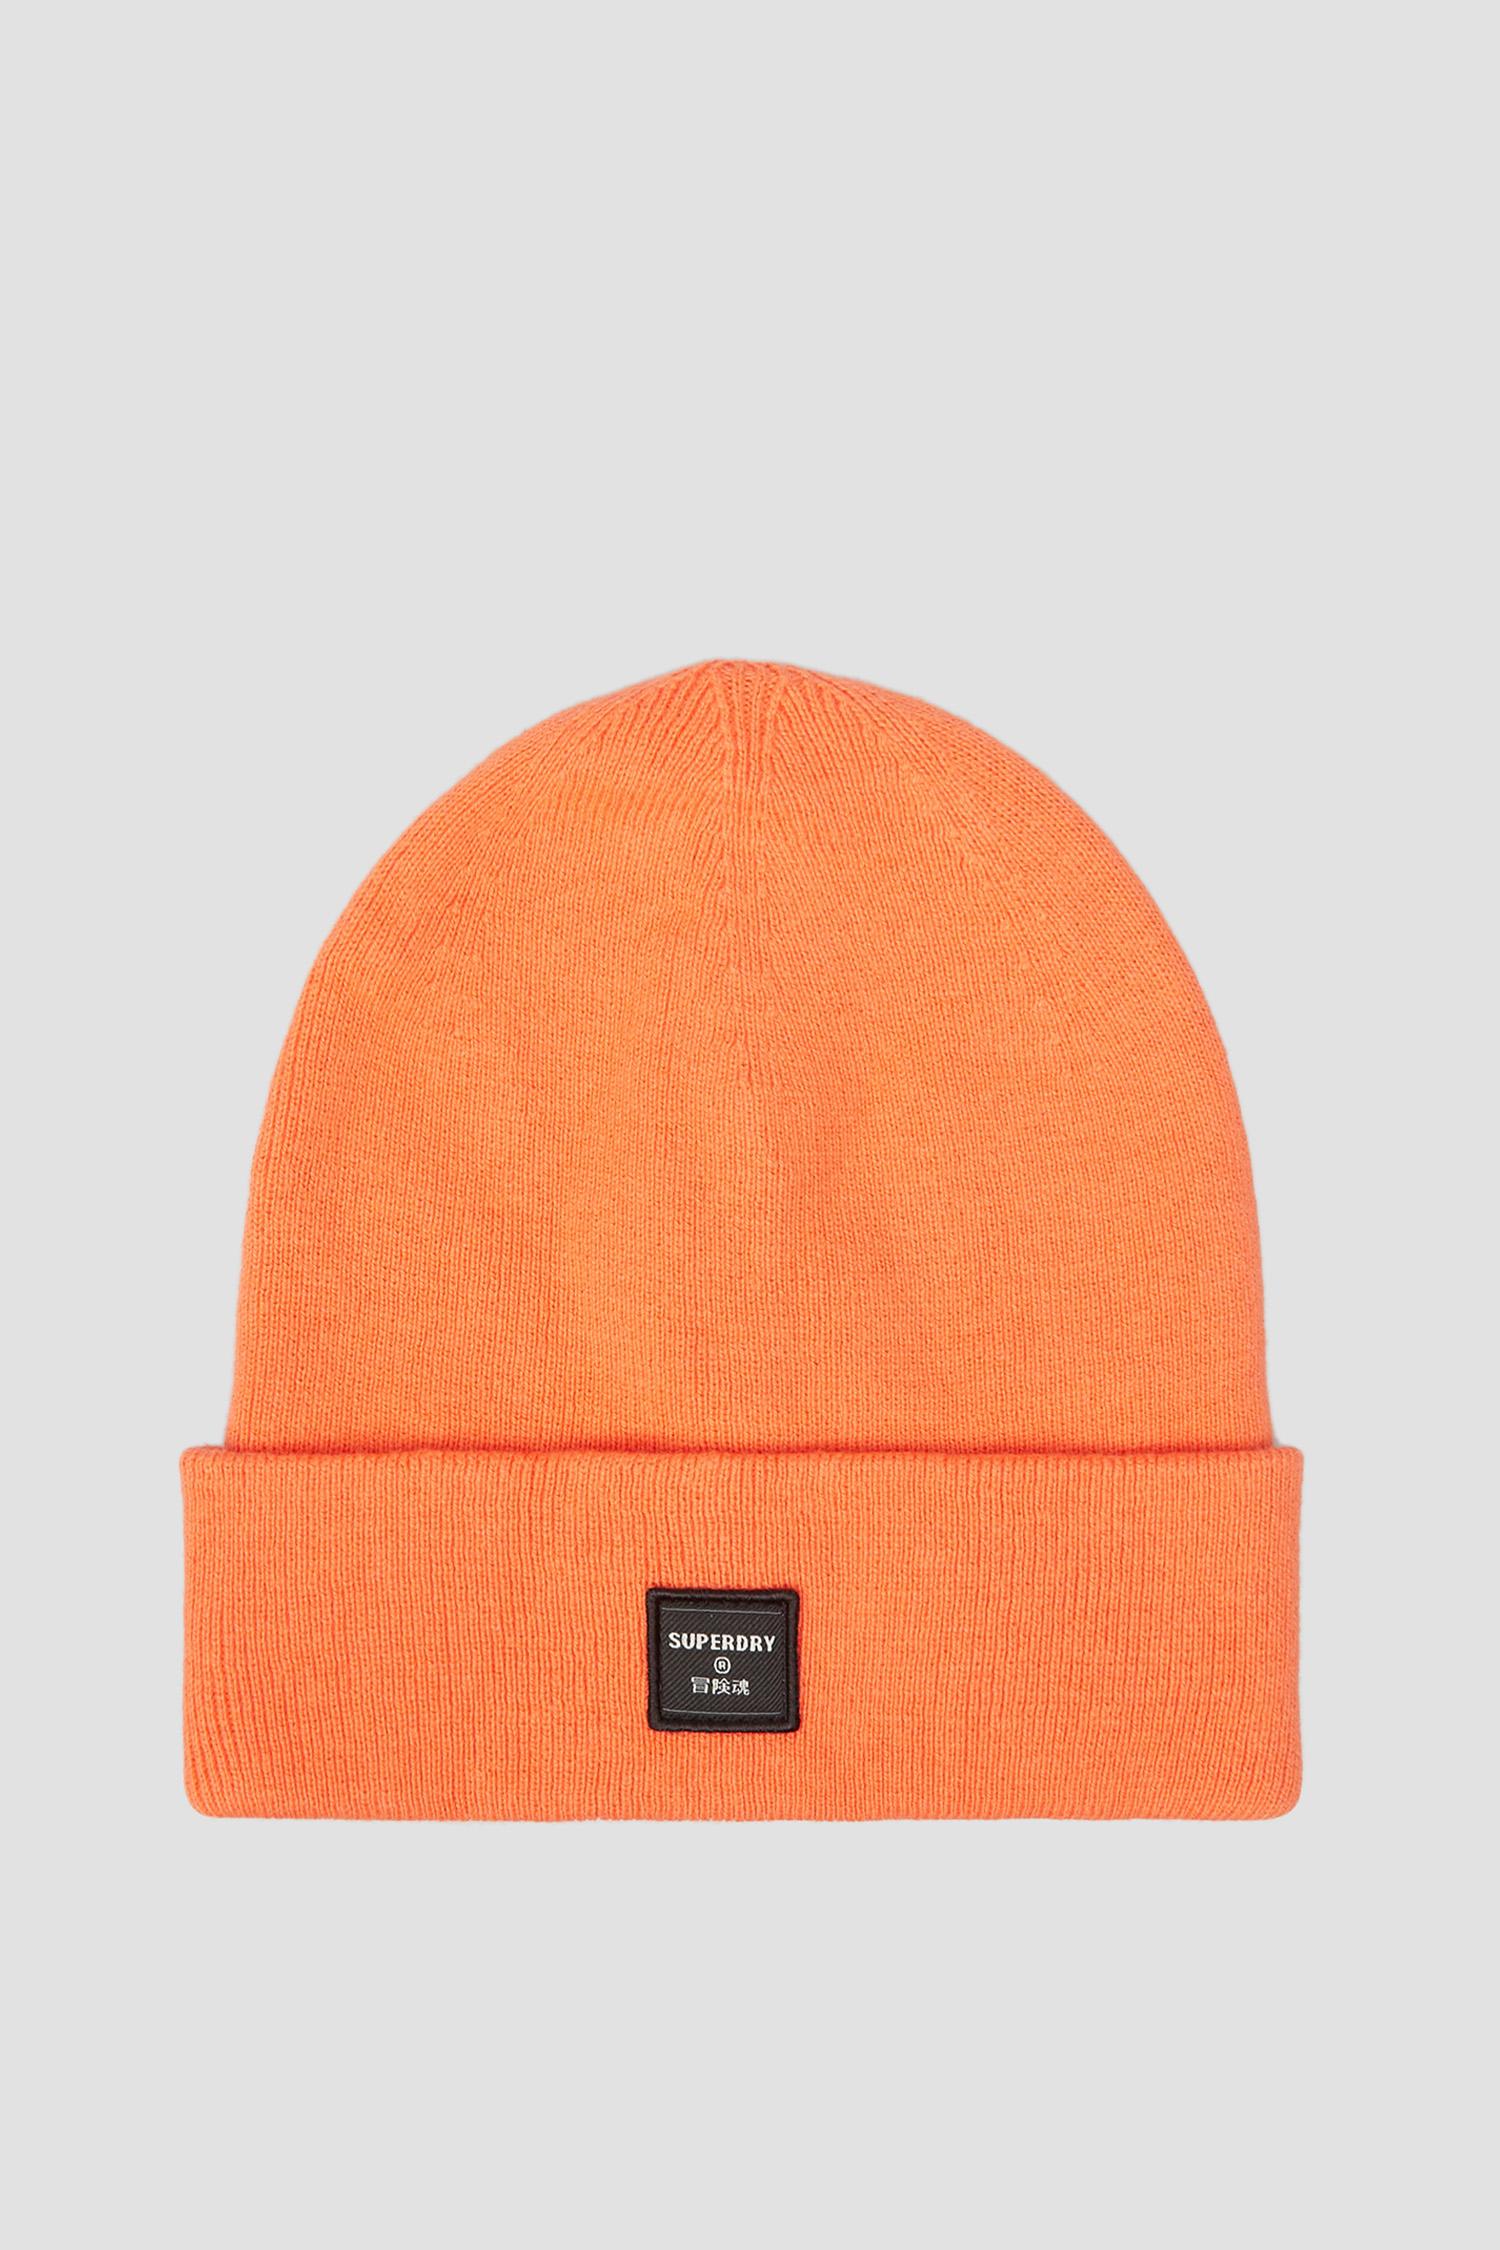 Оранжевая шапка для девушек SuperDry W9010070A;3WL